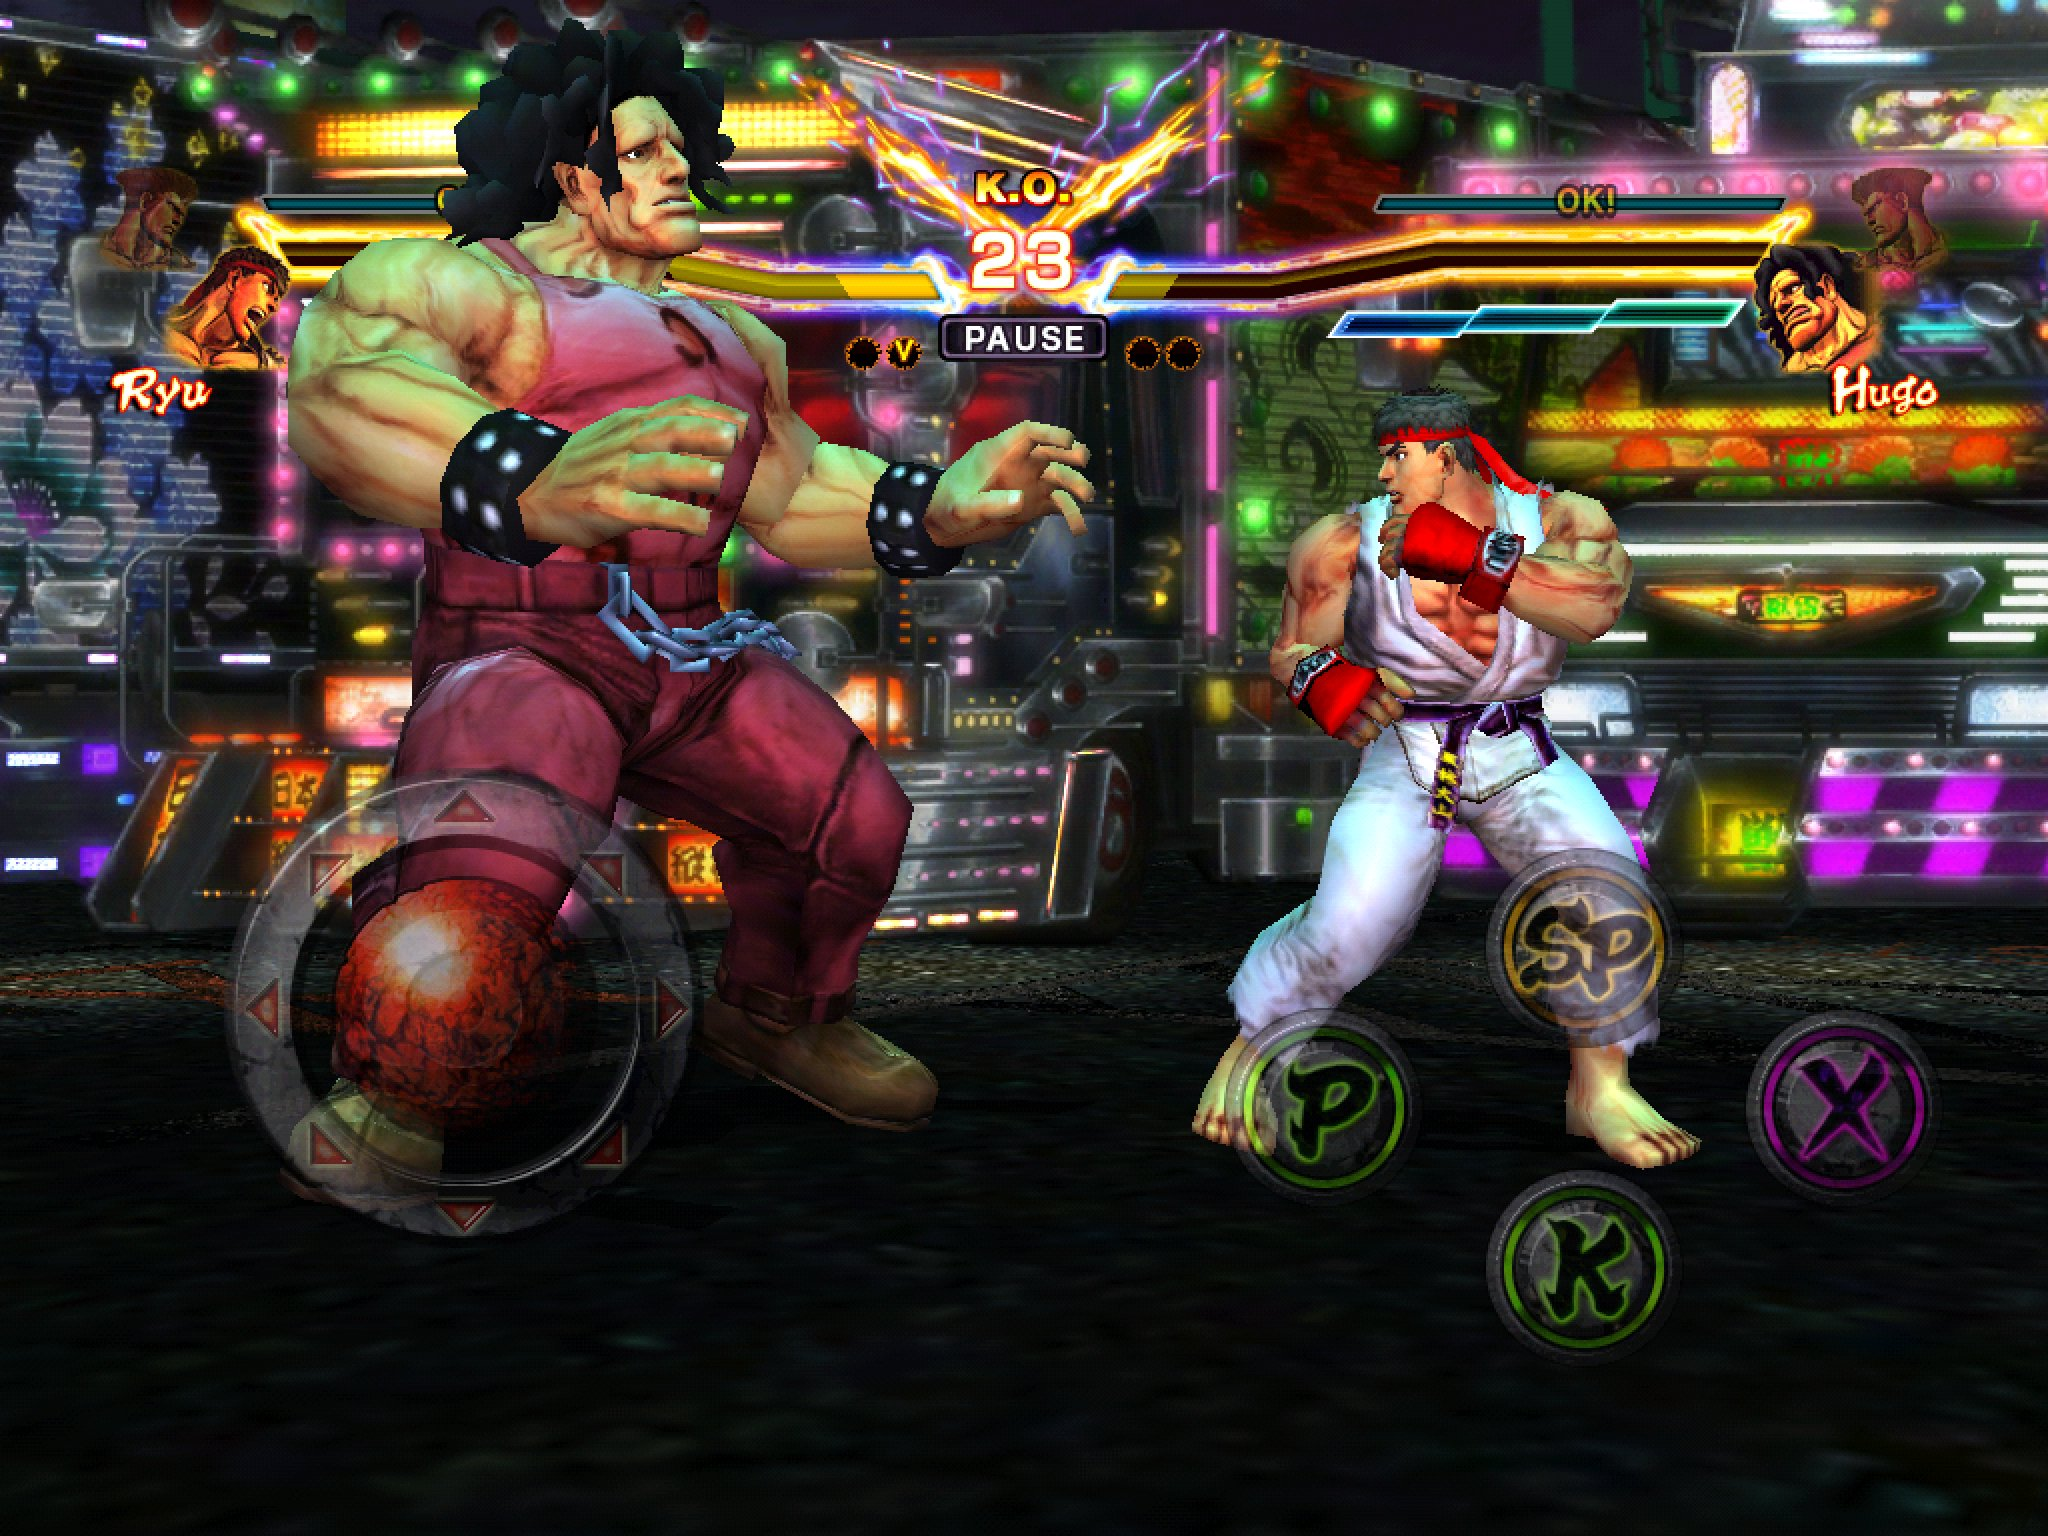 Capcom slashes the price of Marvel vs. Capcom 2 and Street Fighter X Tekken Mobile in honour of Father's Day